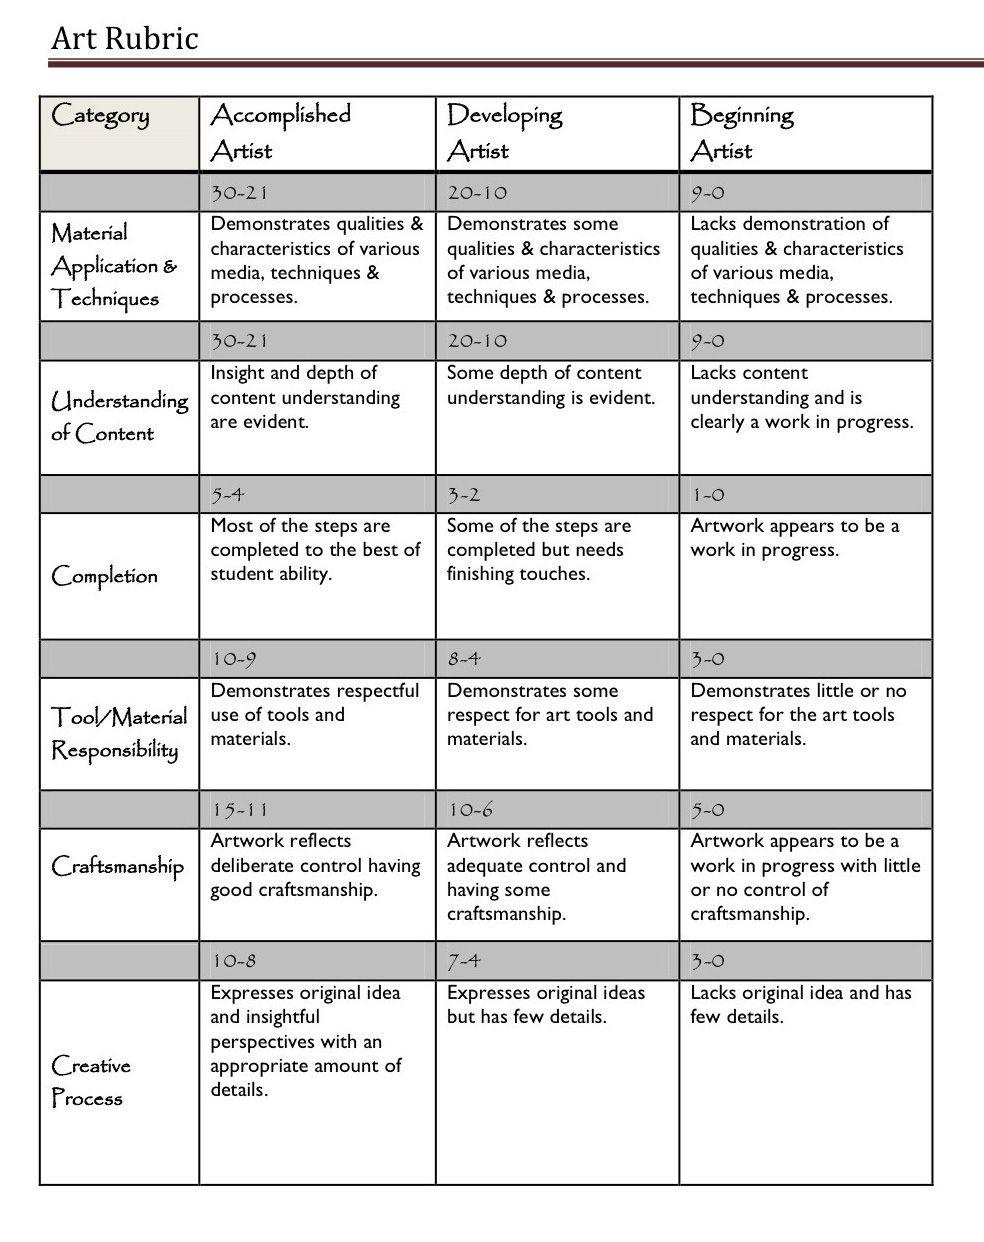 A Handy Rubric For Art Teachers | Assessment Tools & Ideas | Art - Free Printable Art Rubrics